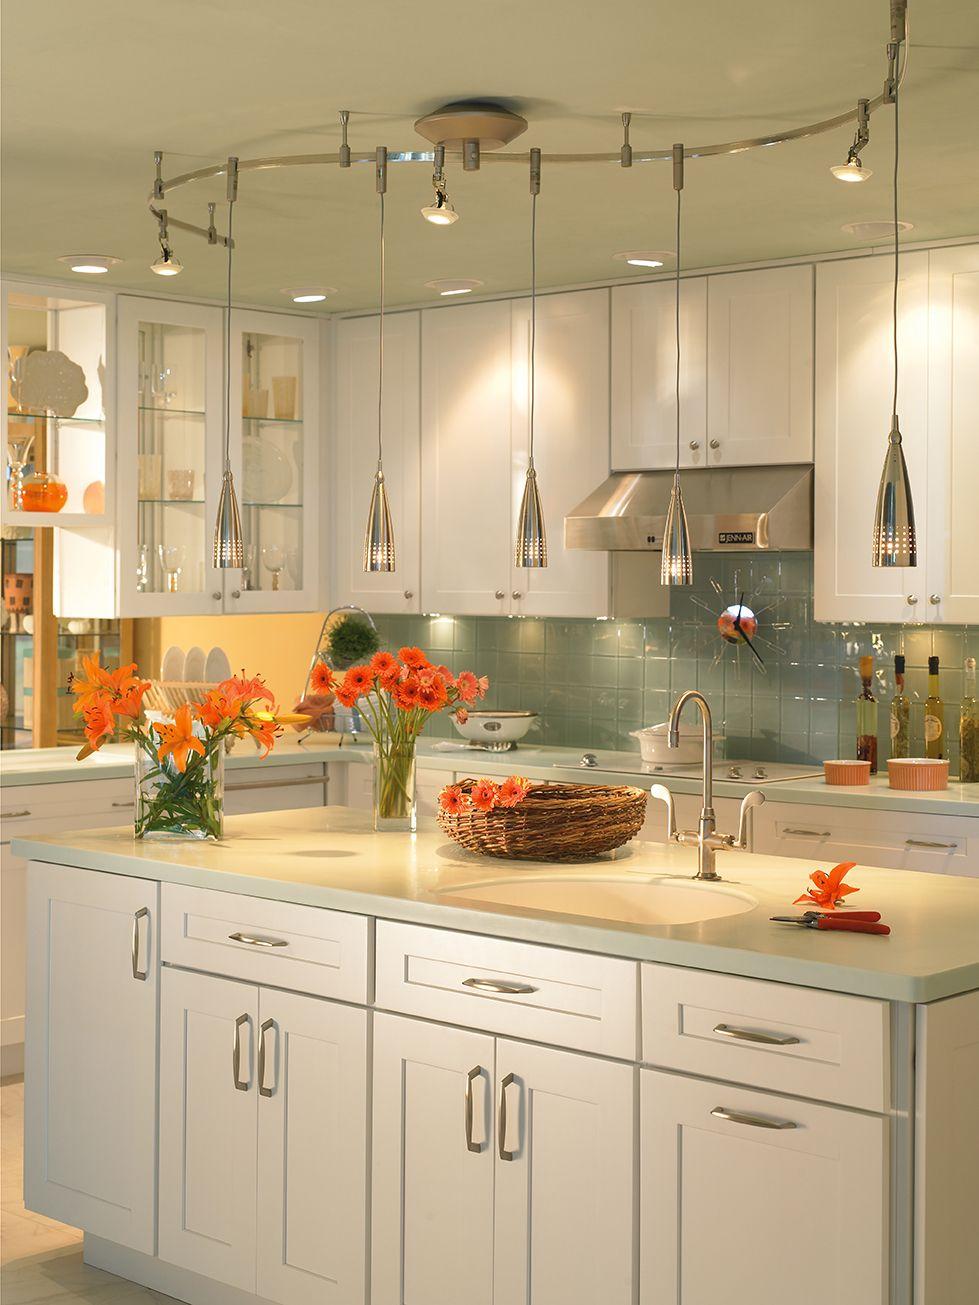 Illuma Flex Track Lighting Installed In A Kitchen From: Pin By Denney Lighting & Design On Kitchen & Bar Lighting